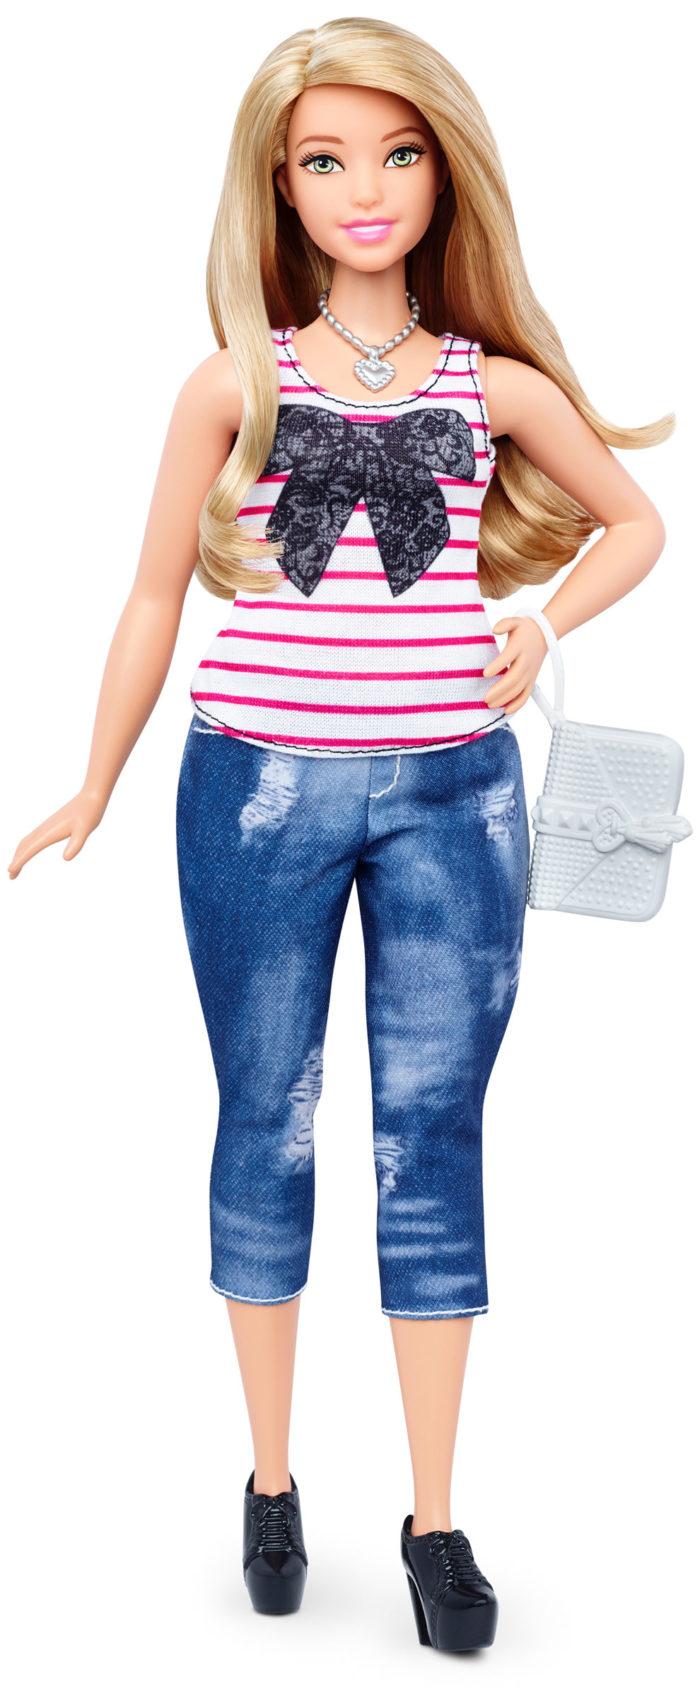 barbie-nuove-curvy-bassa-alta-realistica-08